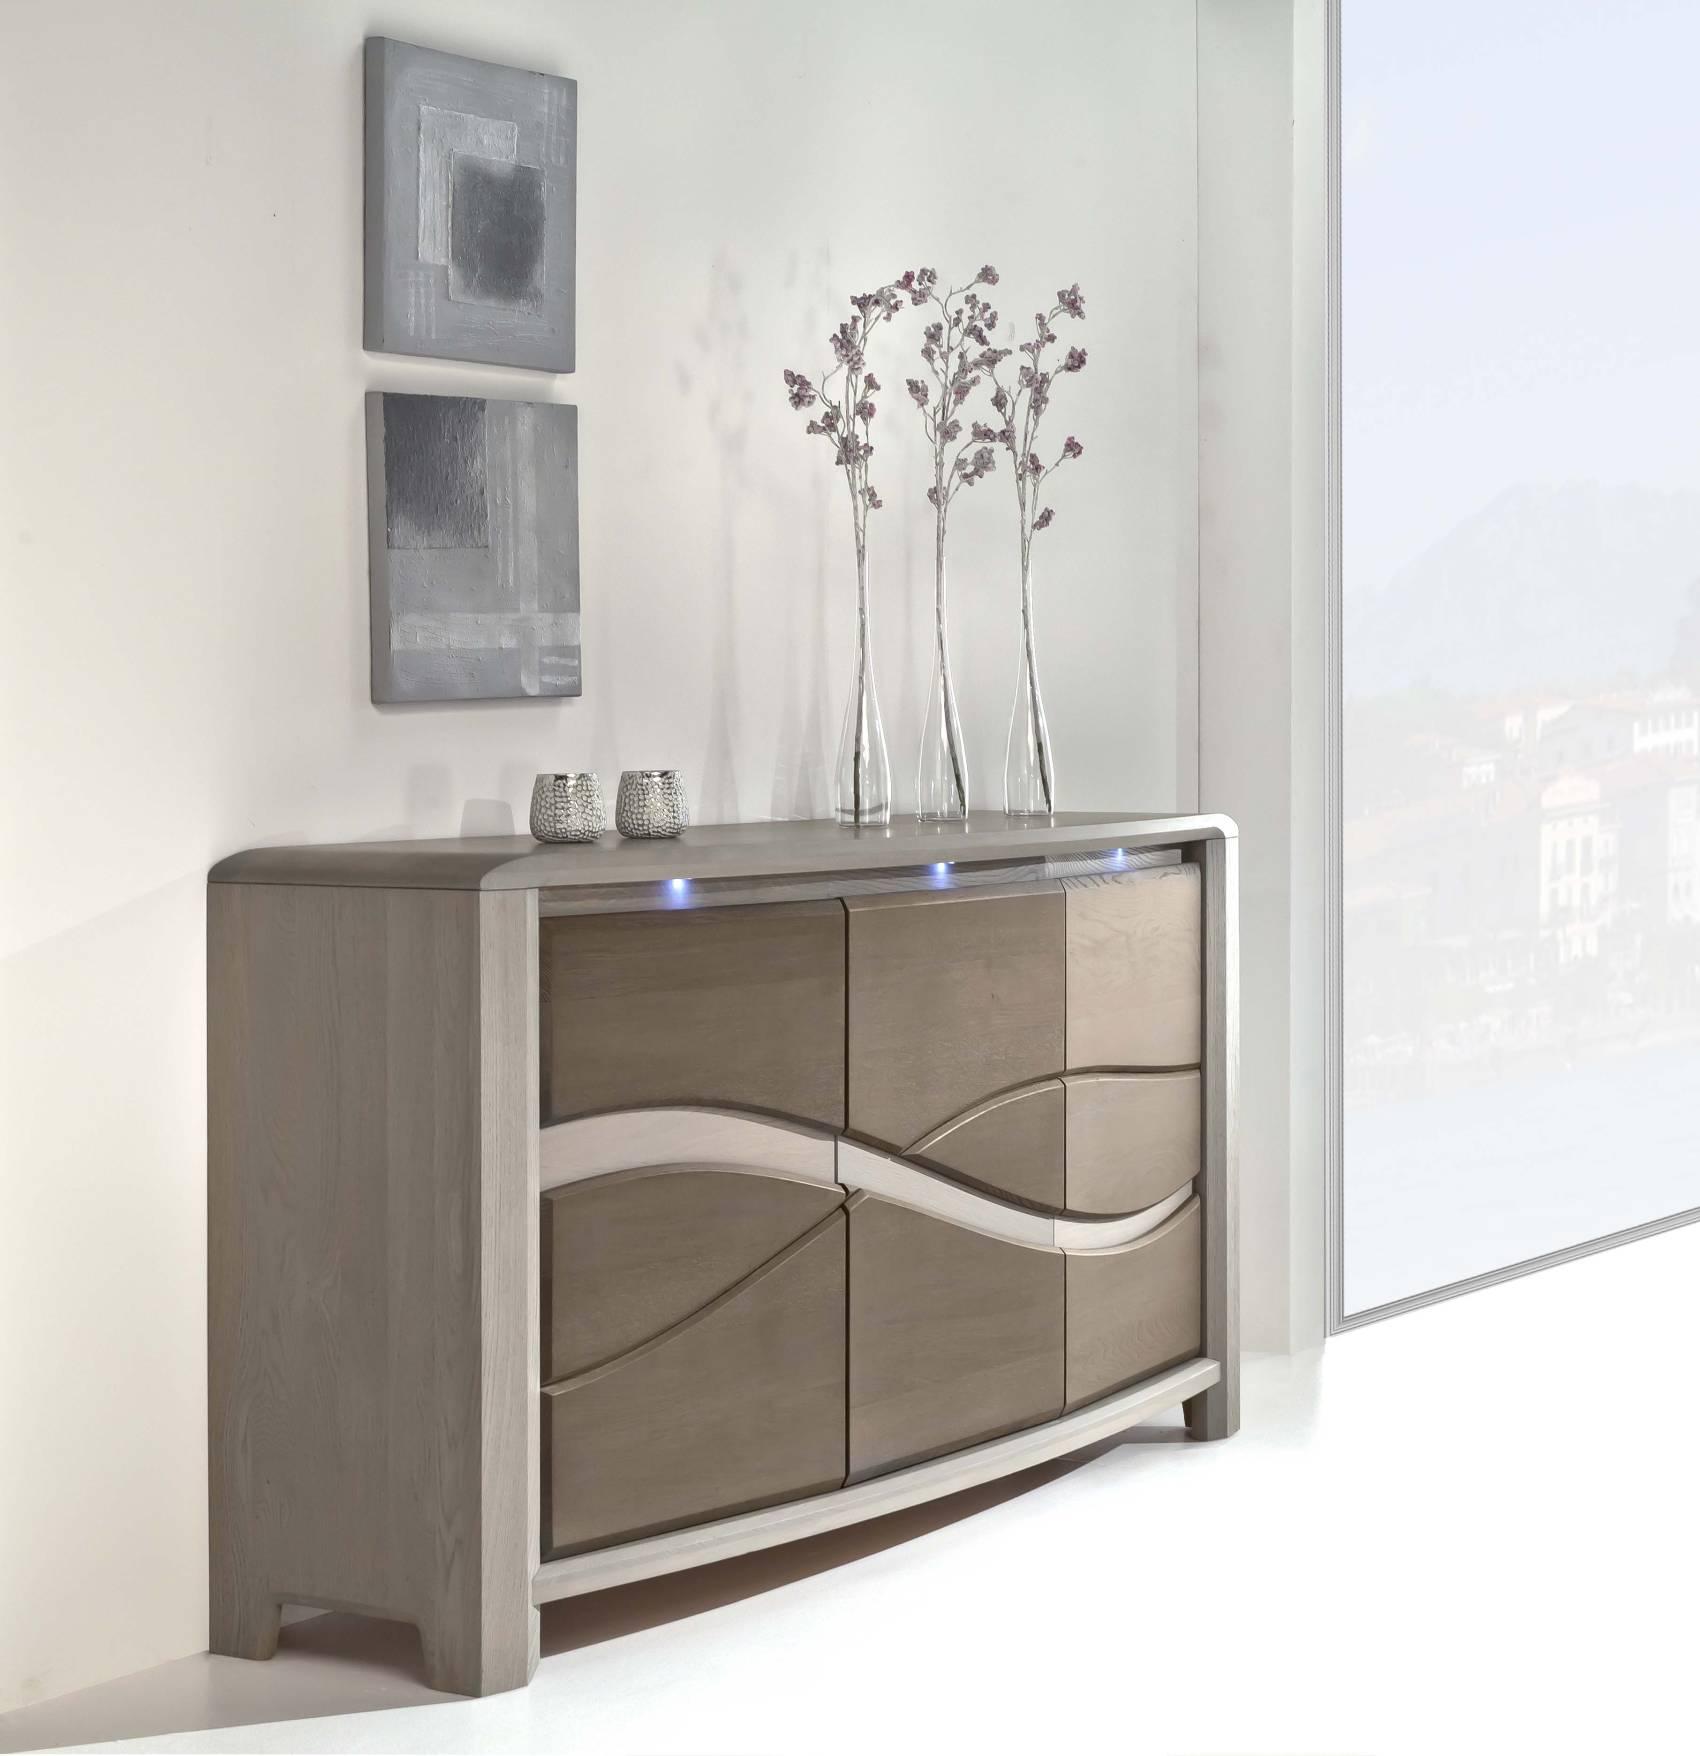 Meuble salle a manger oceane meubles gibaud cateau for Atelier du meuble rustique